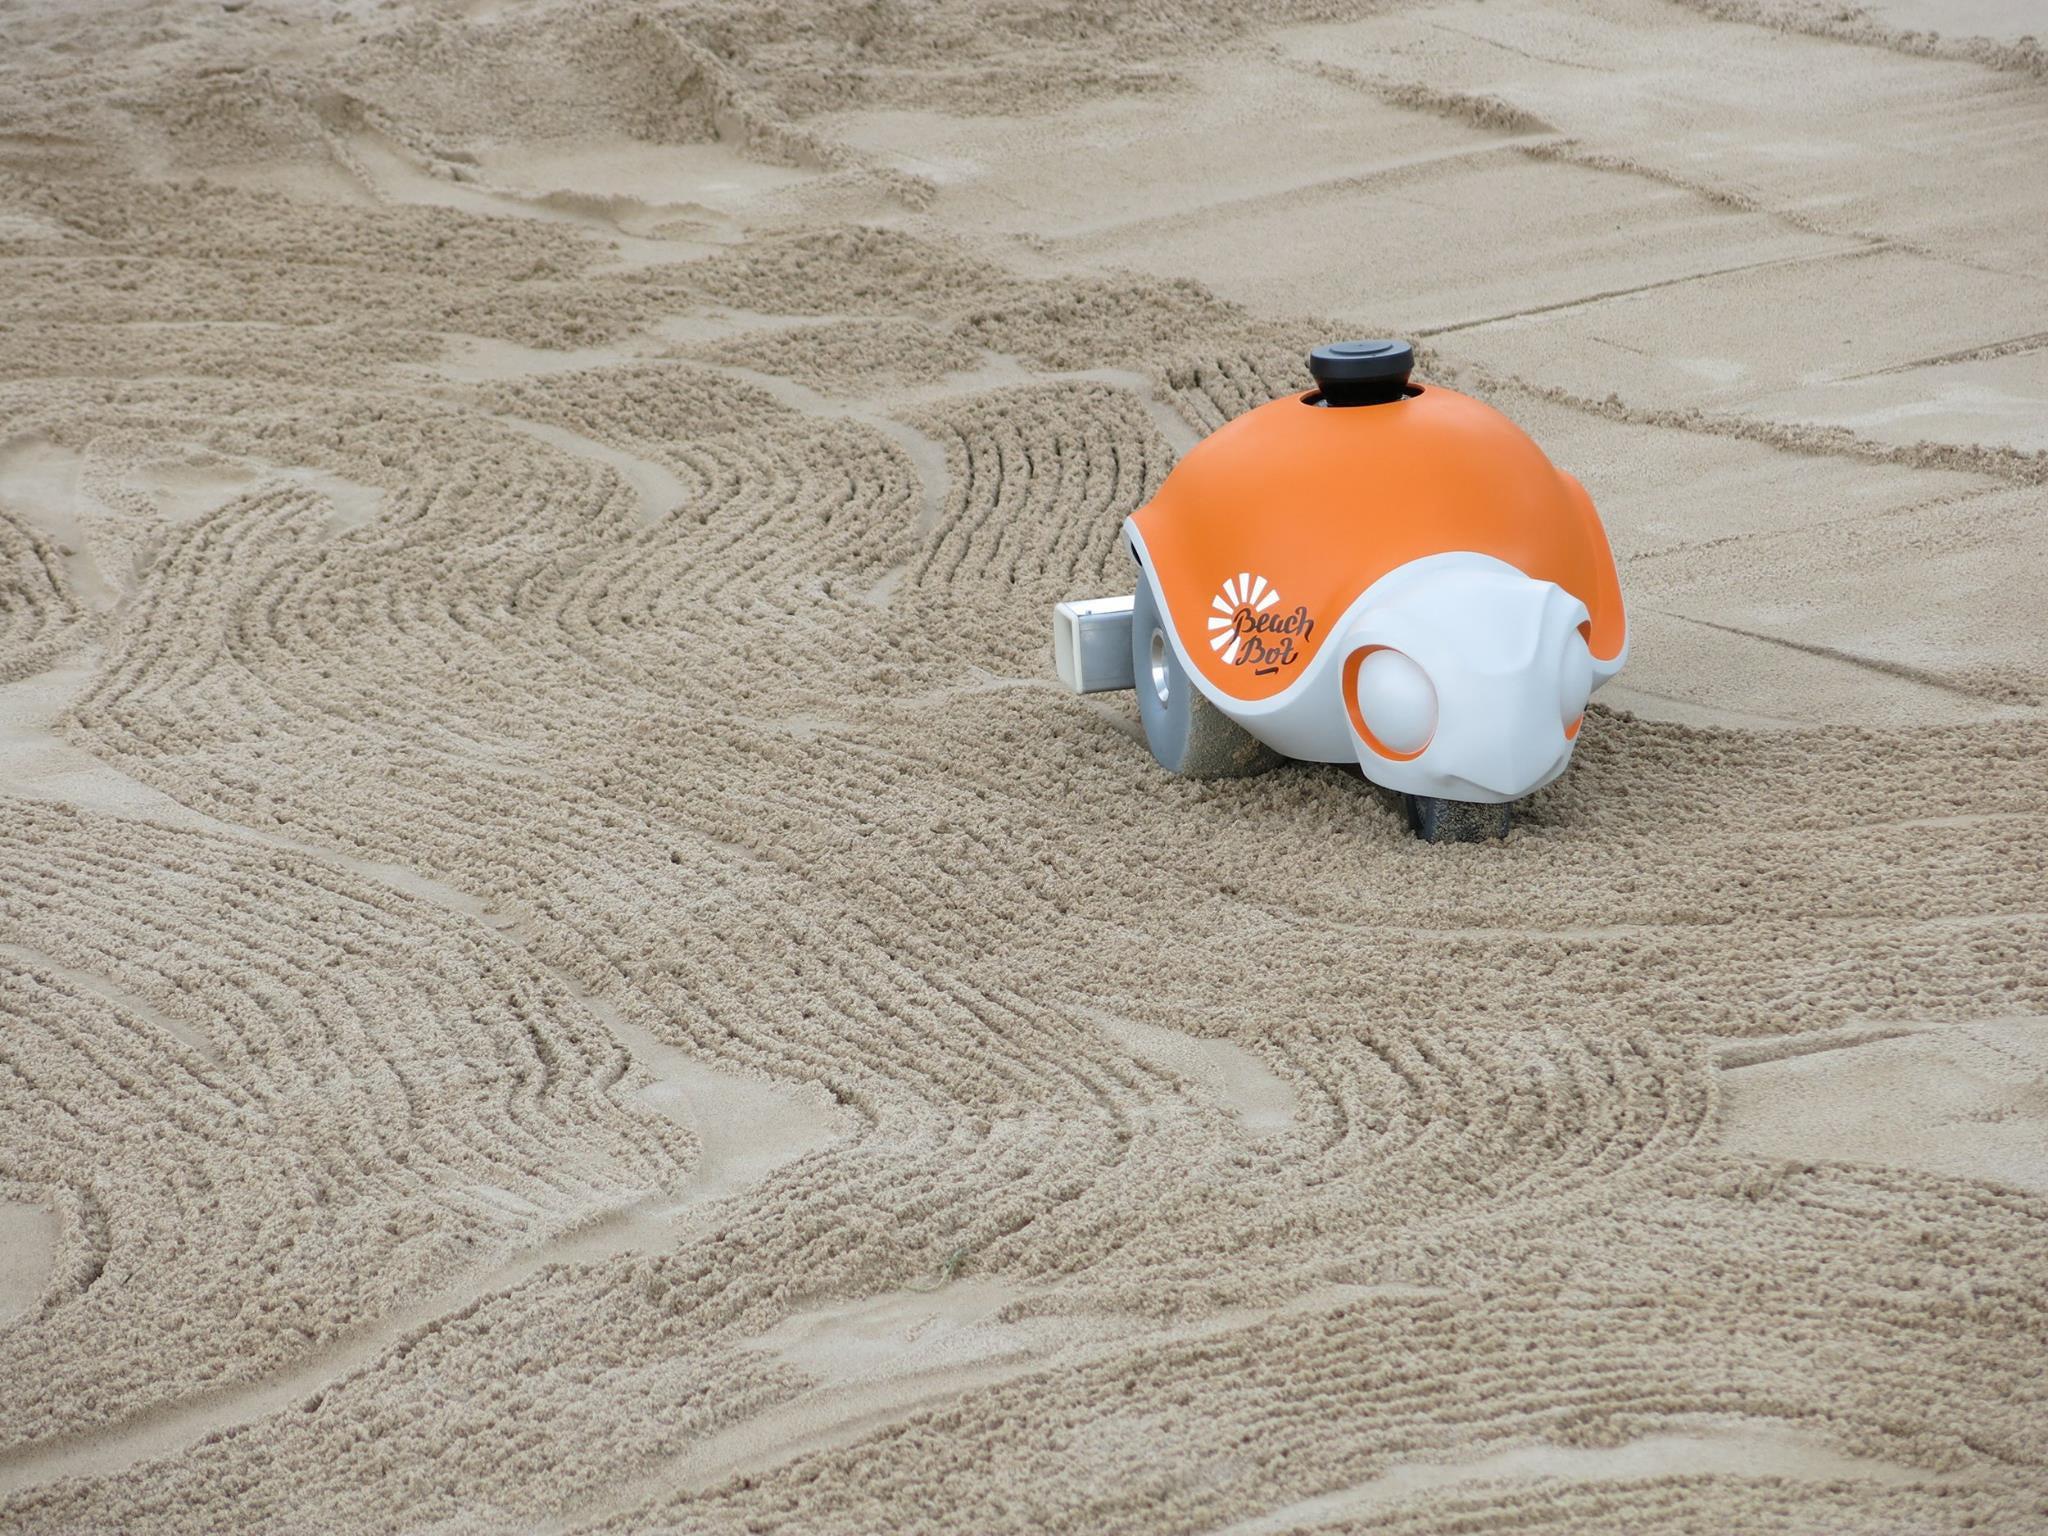 Disney Creates Beach-Dwelling Robot That Draws Adorable Cartoons In Sand